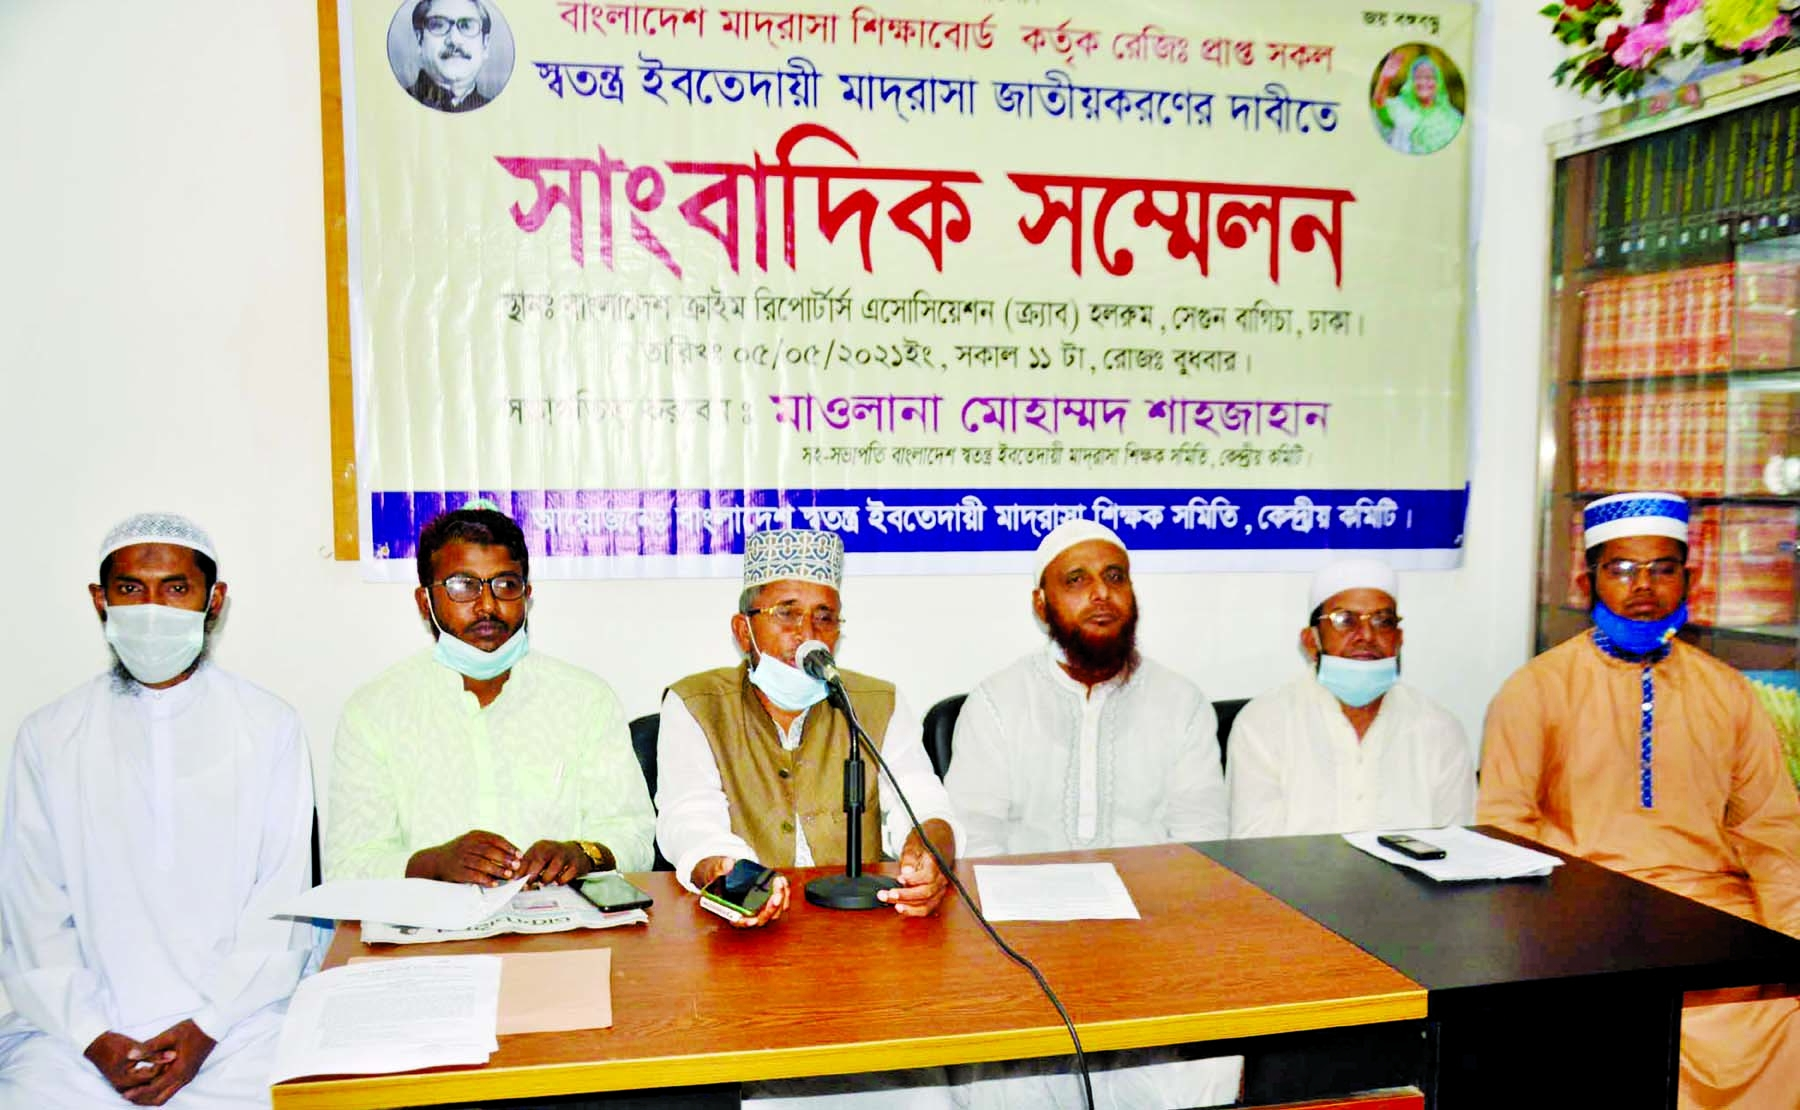 Secretary General of Bangladesh Swatantra Ibtedayee Madrasa Shikshak Samity Kazi Moklesur Rahman was present, among others, at the press conference organised by the samity in DRU auditorium on Wednesday demanding nationalization of Swatantra Ibtedayee madrasas.